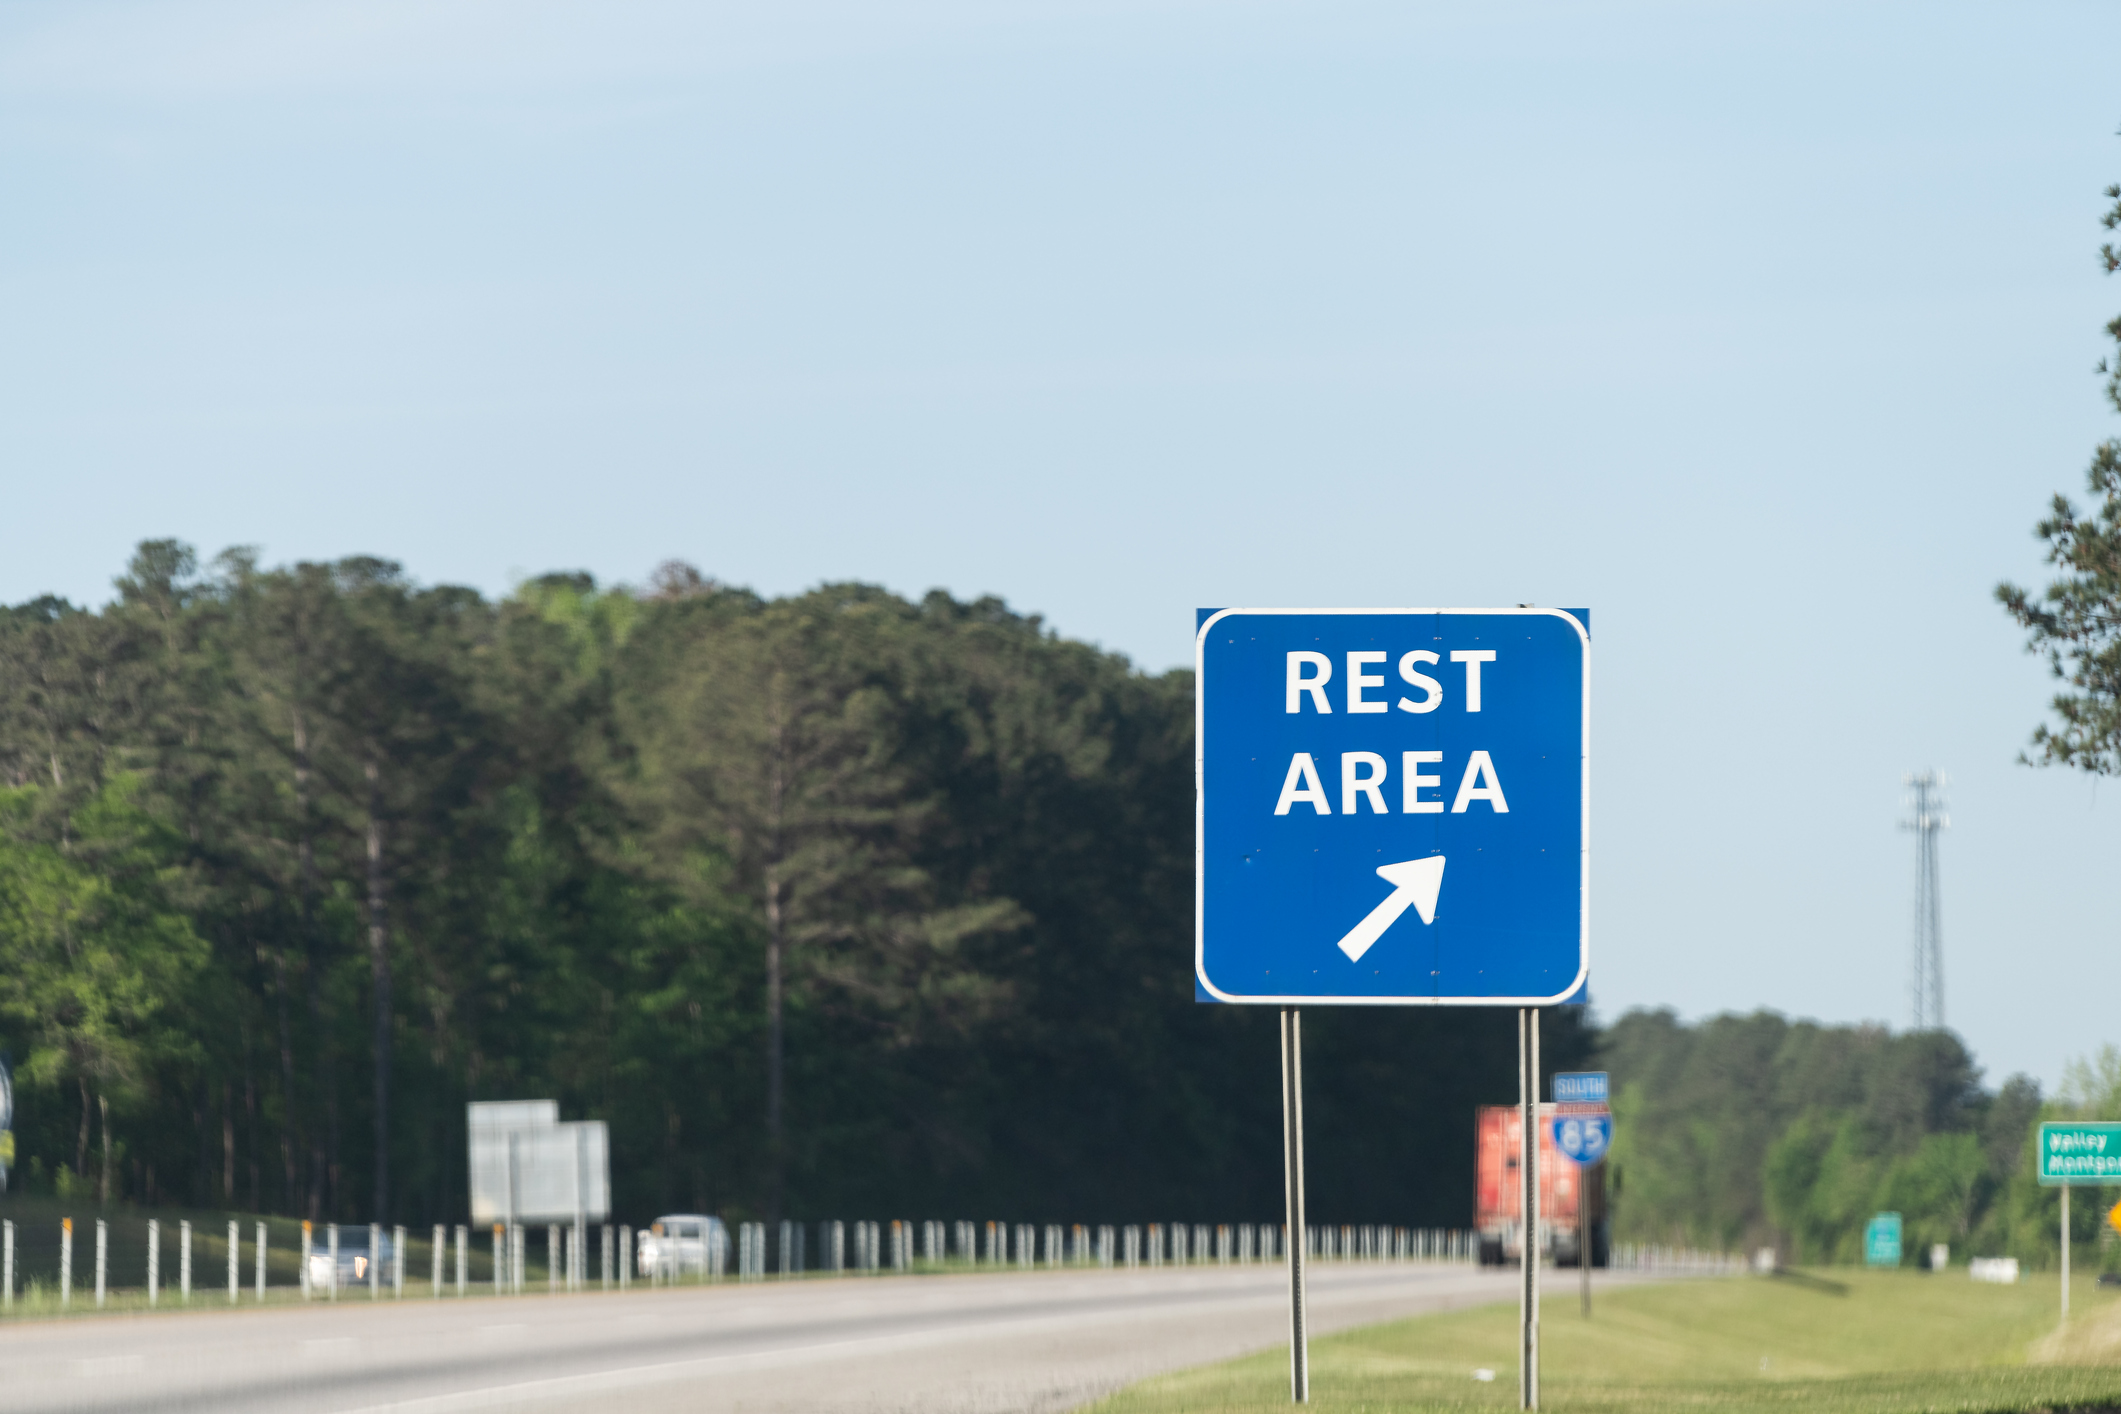 Rest area alongside the highway.